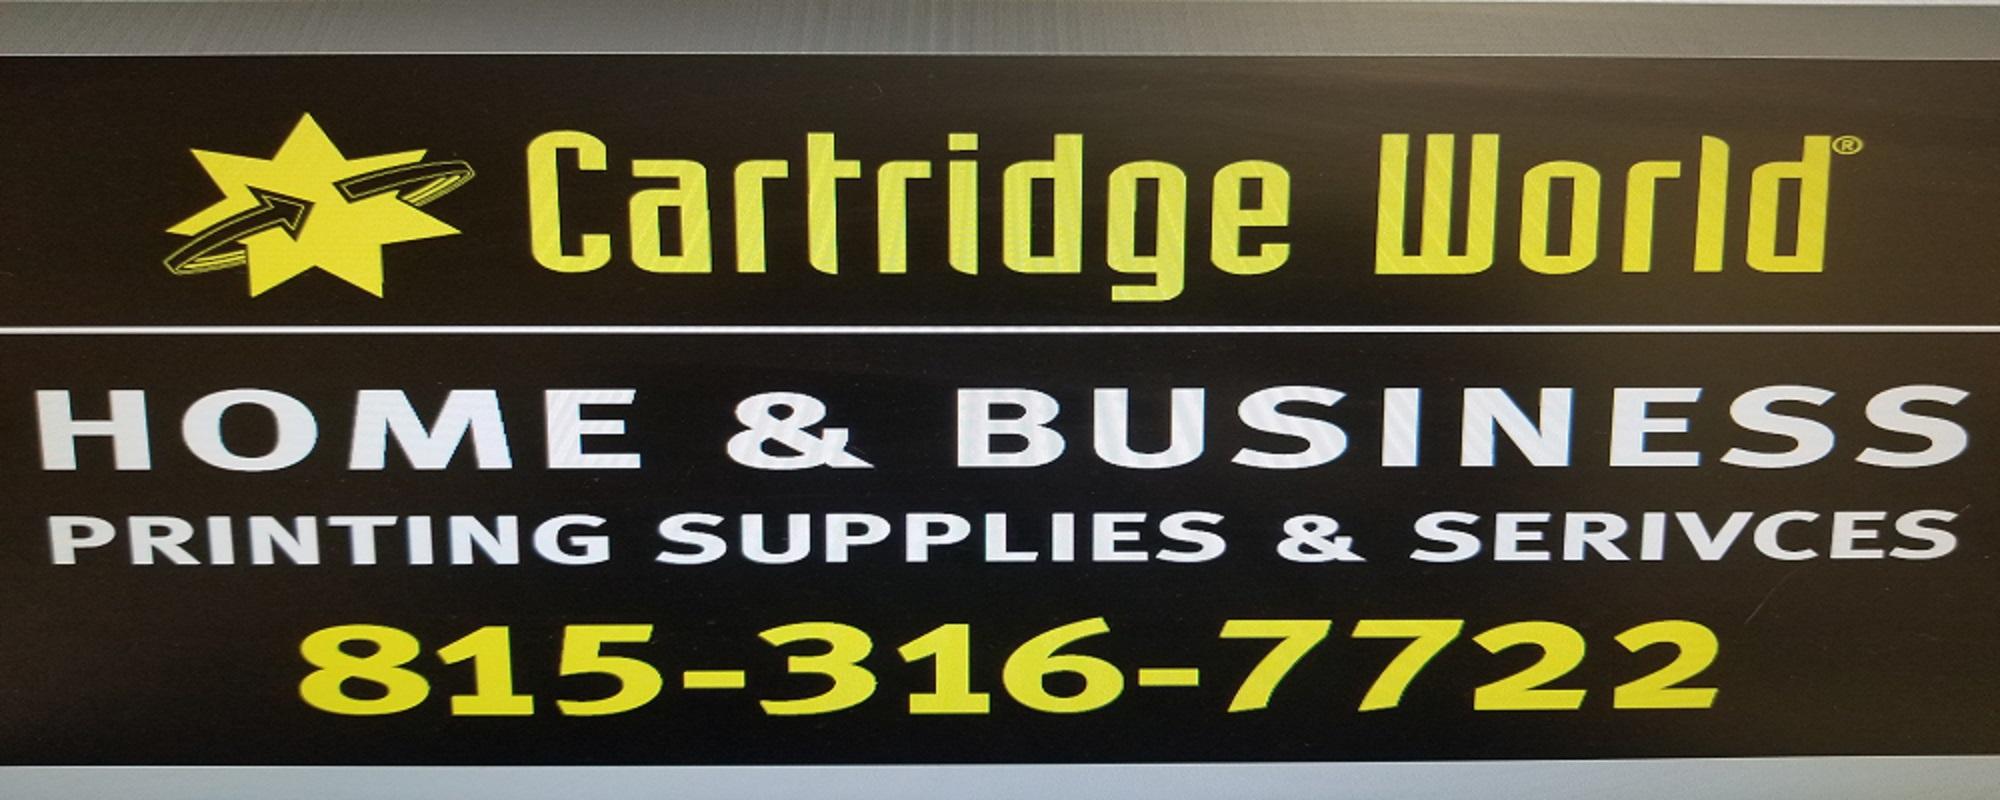 cartridge-world-rockford